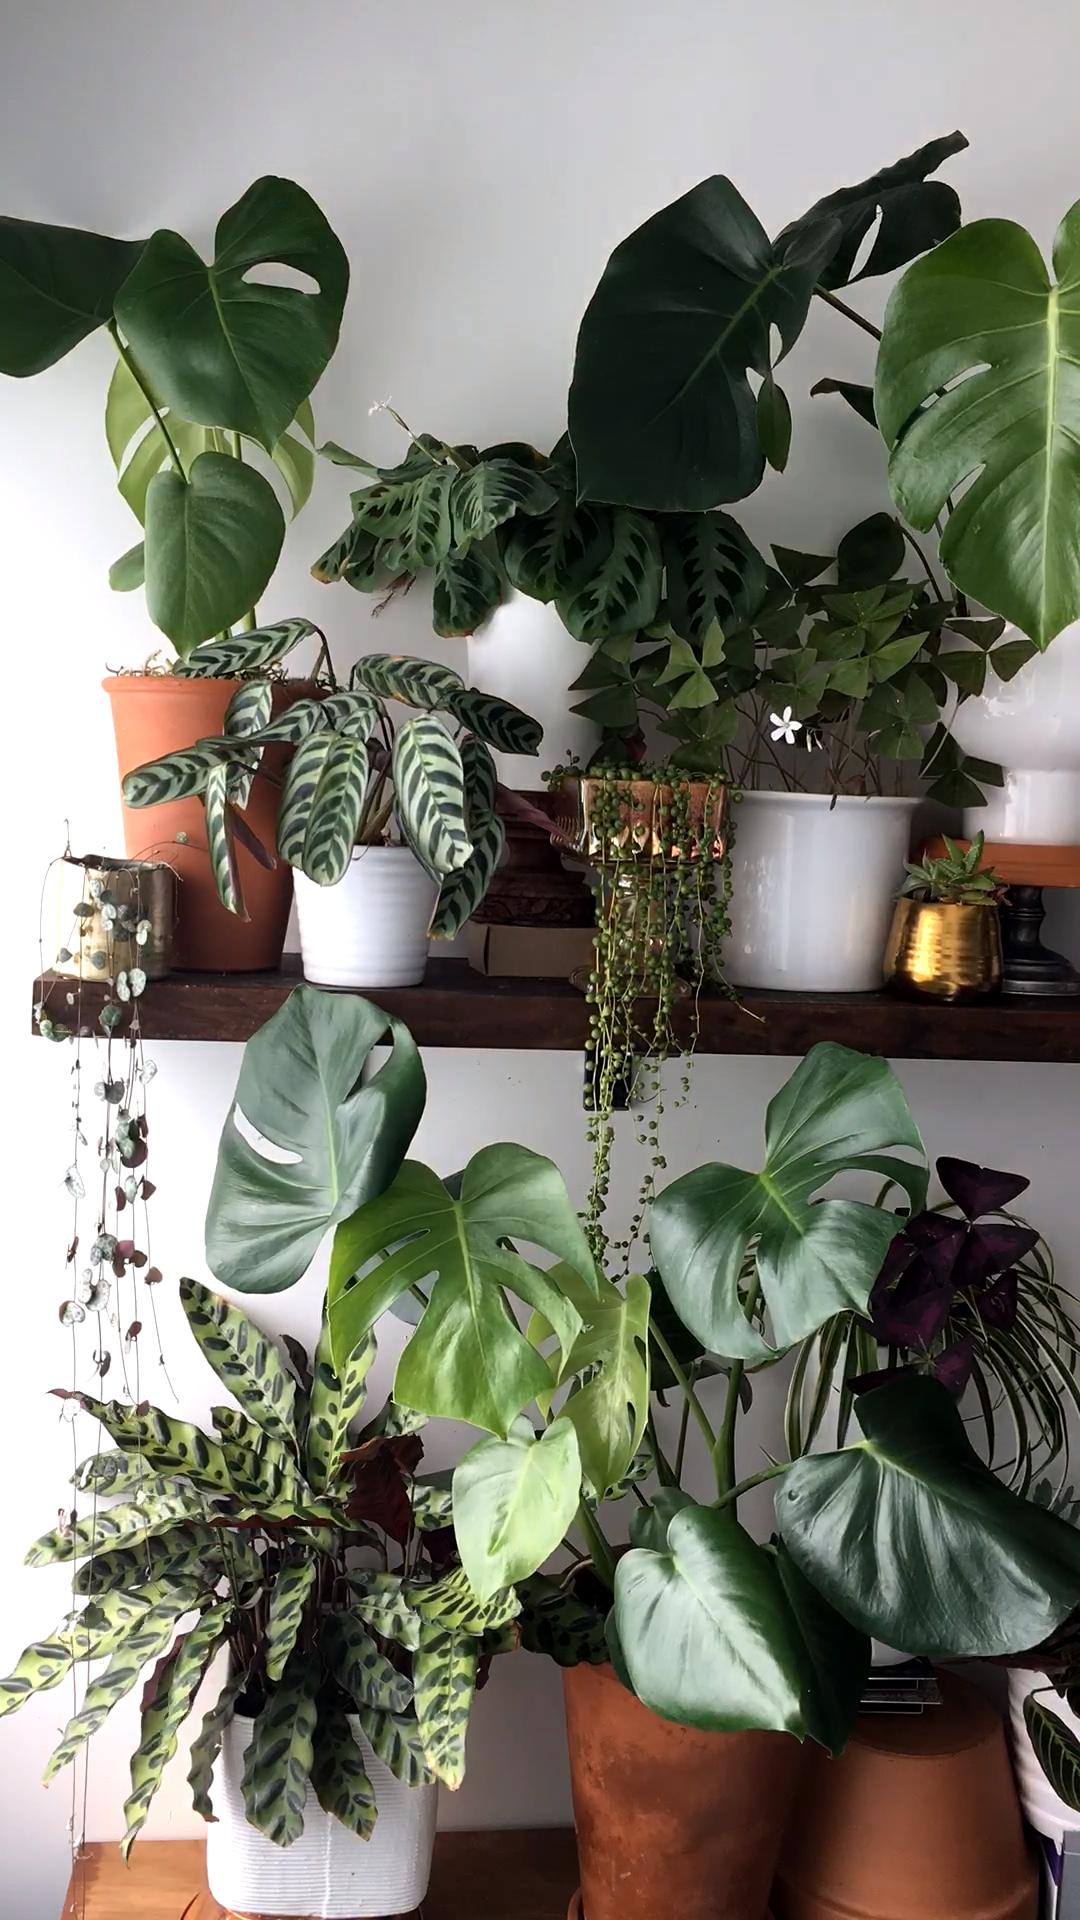 Monstera plant unfurls new leaves - time-lapse video